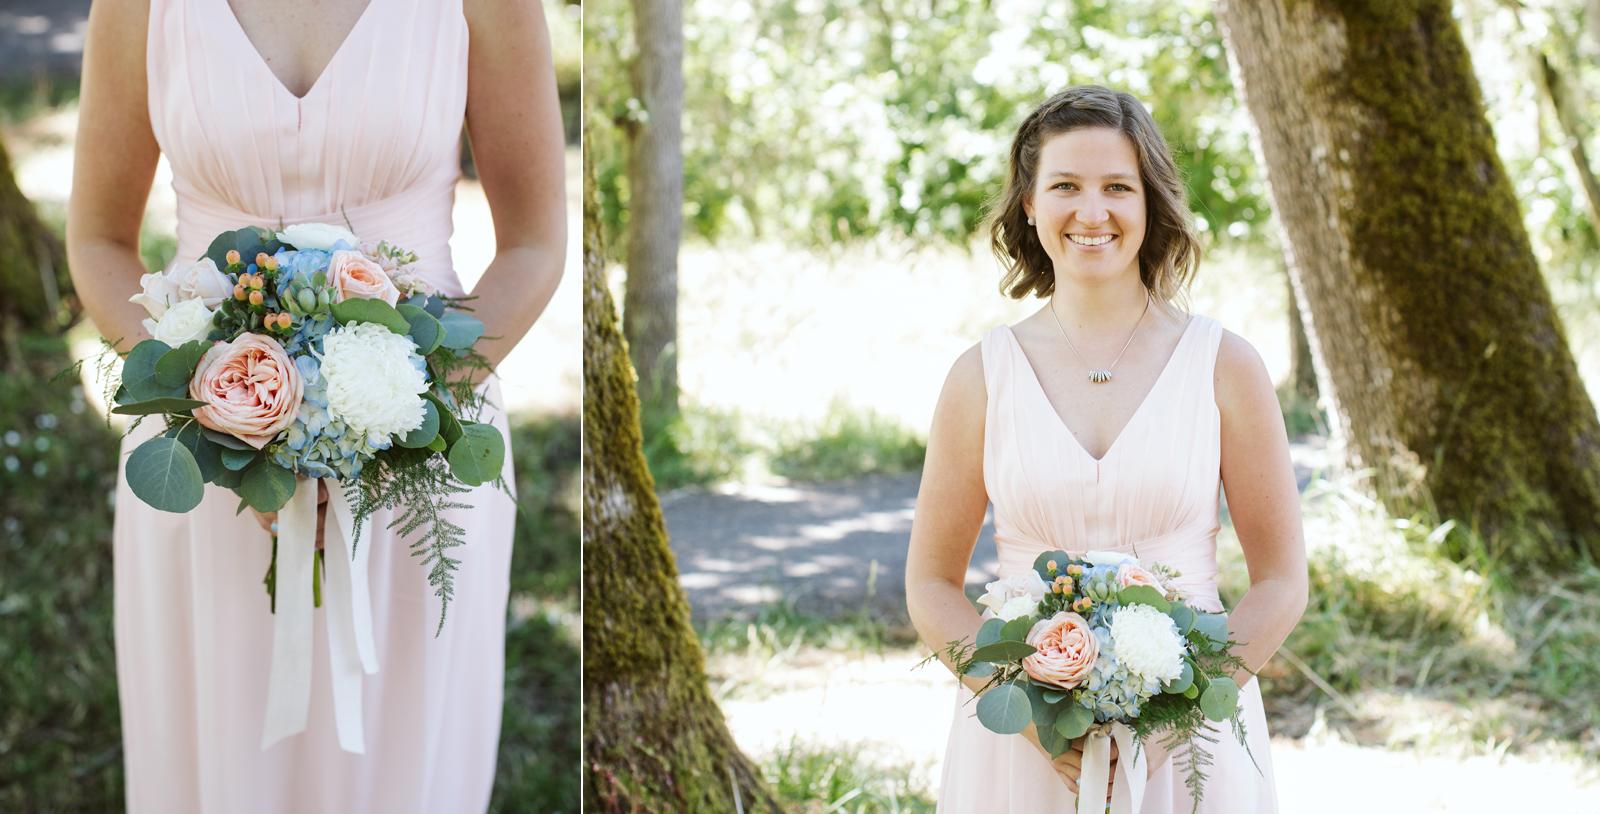 031-daronjackson-rachel-michael-wedding-mtpisgah.jpg